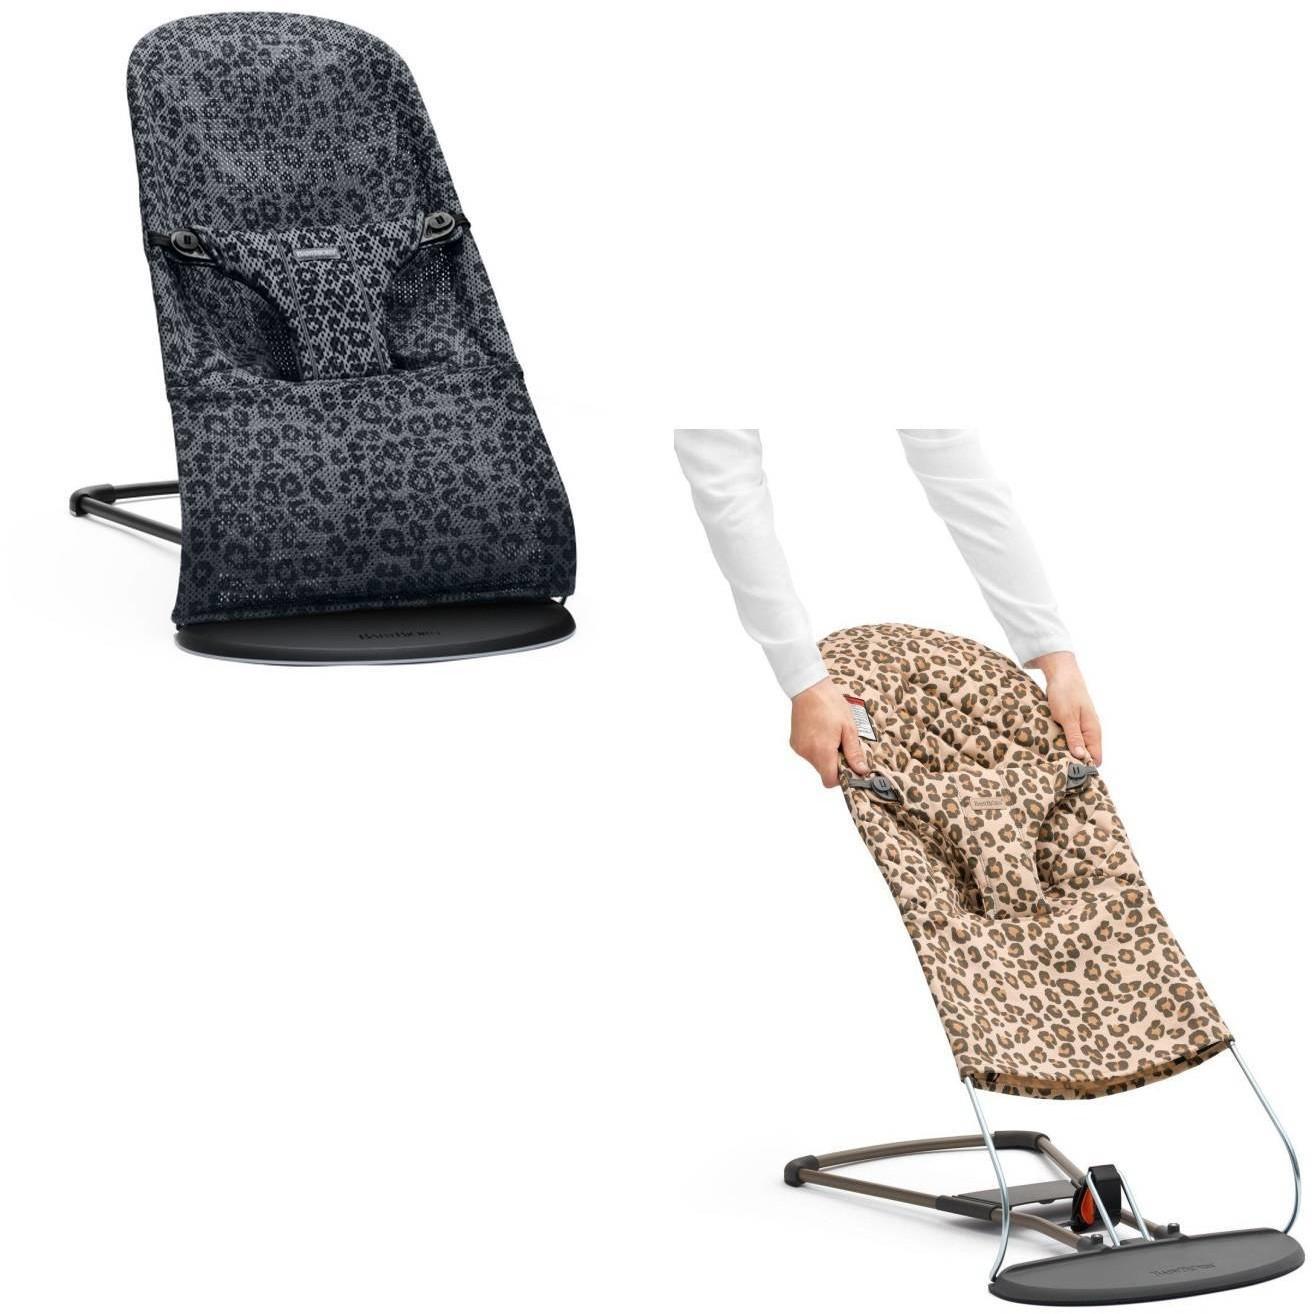 BABYBJORN leżaczek BLISS MESH - Antracytowy/Leopard + poszycie do leżaczka Balance Bliss Beż/Leopard, Cotton scandinavian-baby-9375-0